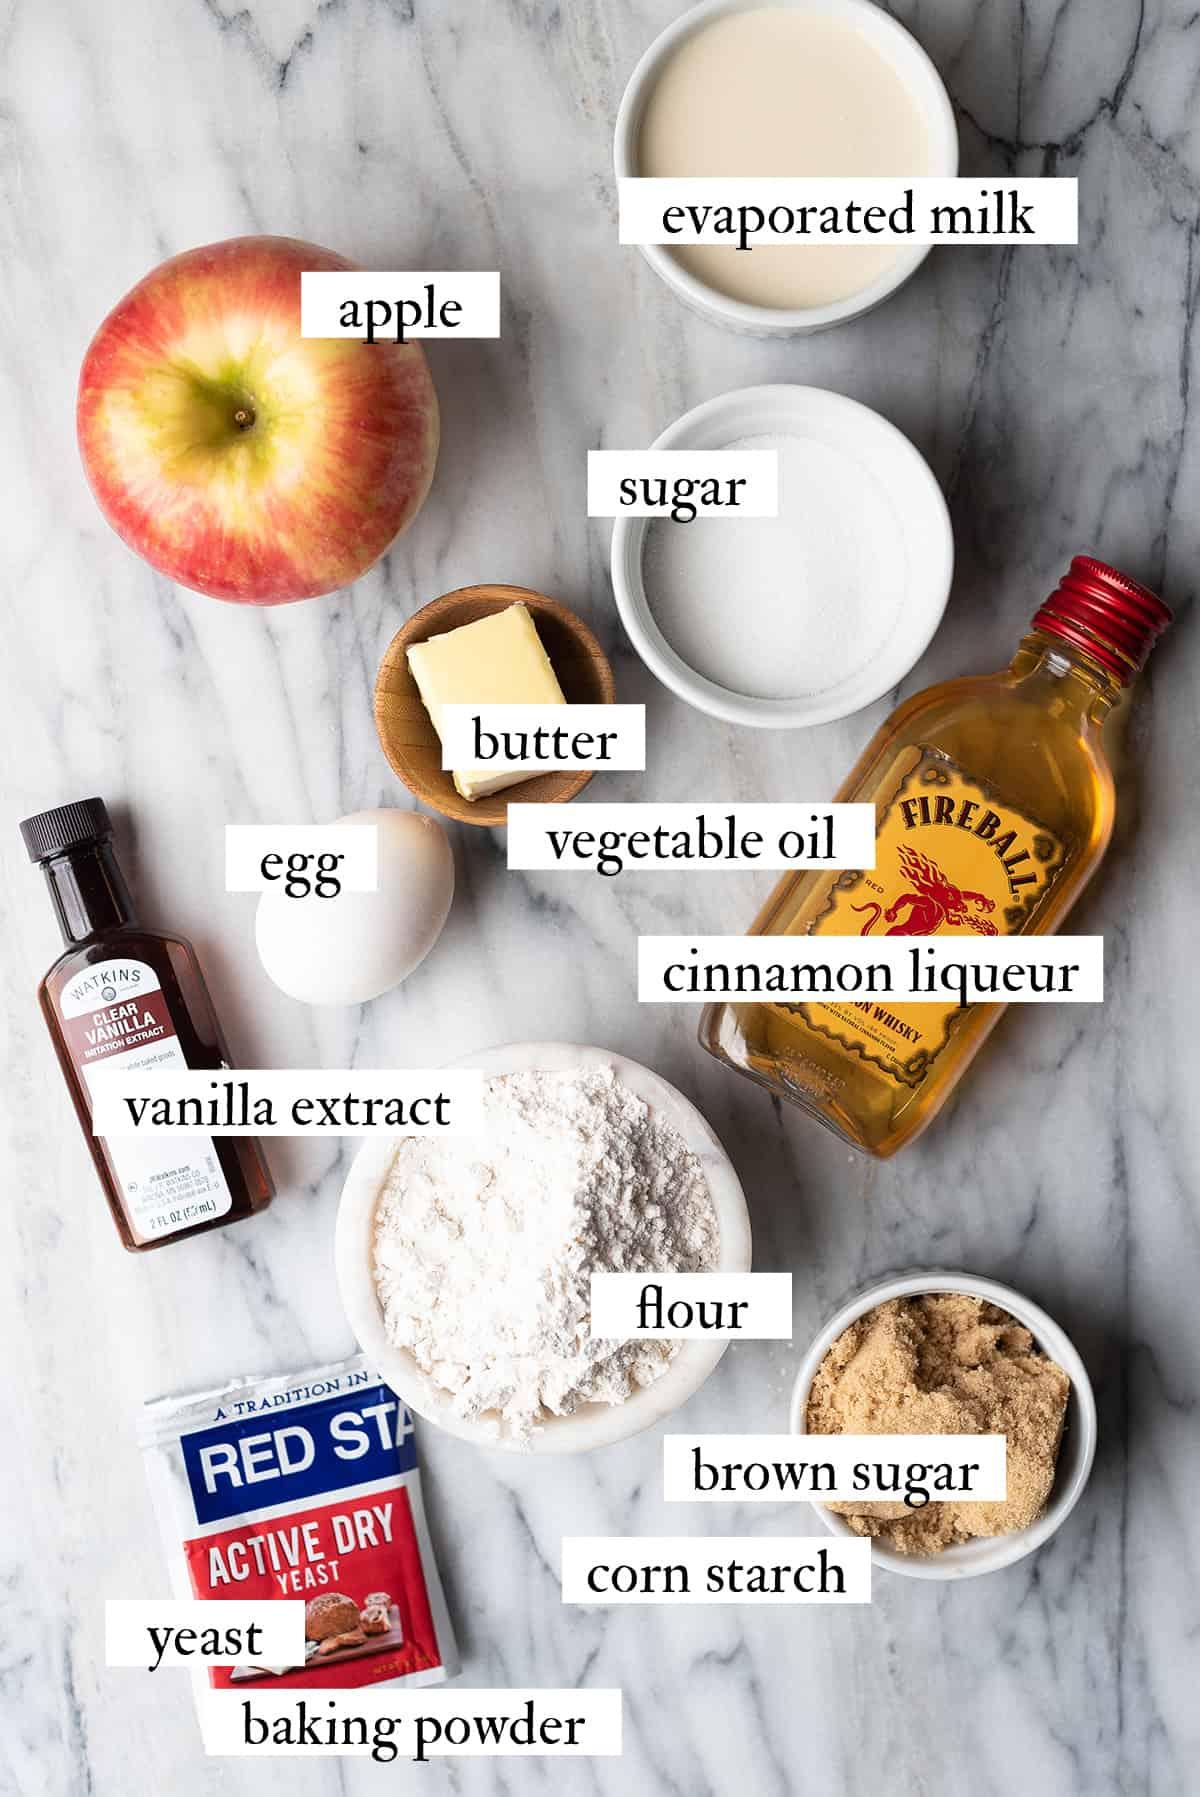 boozy apple beignet ingredients on marble surface